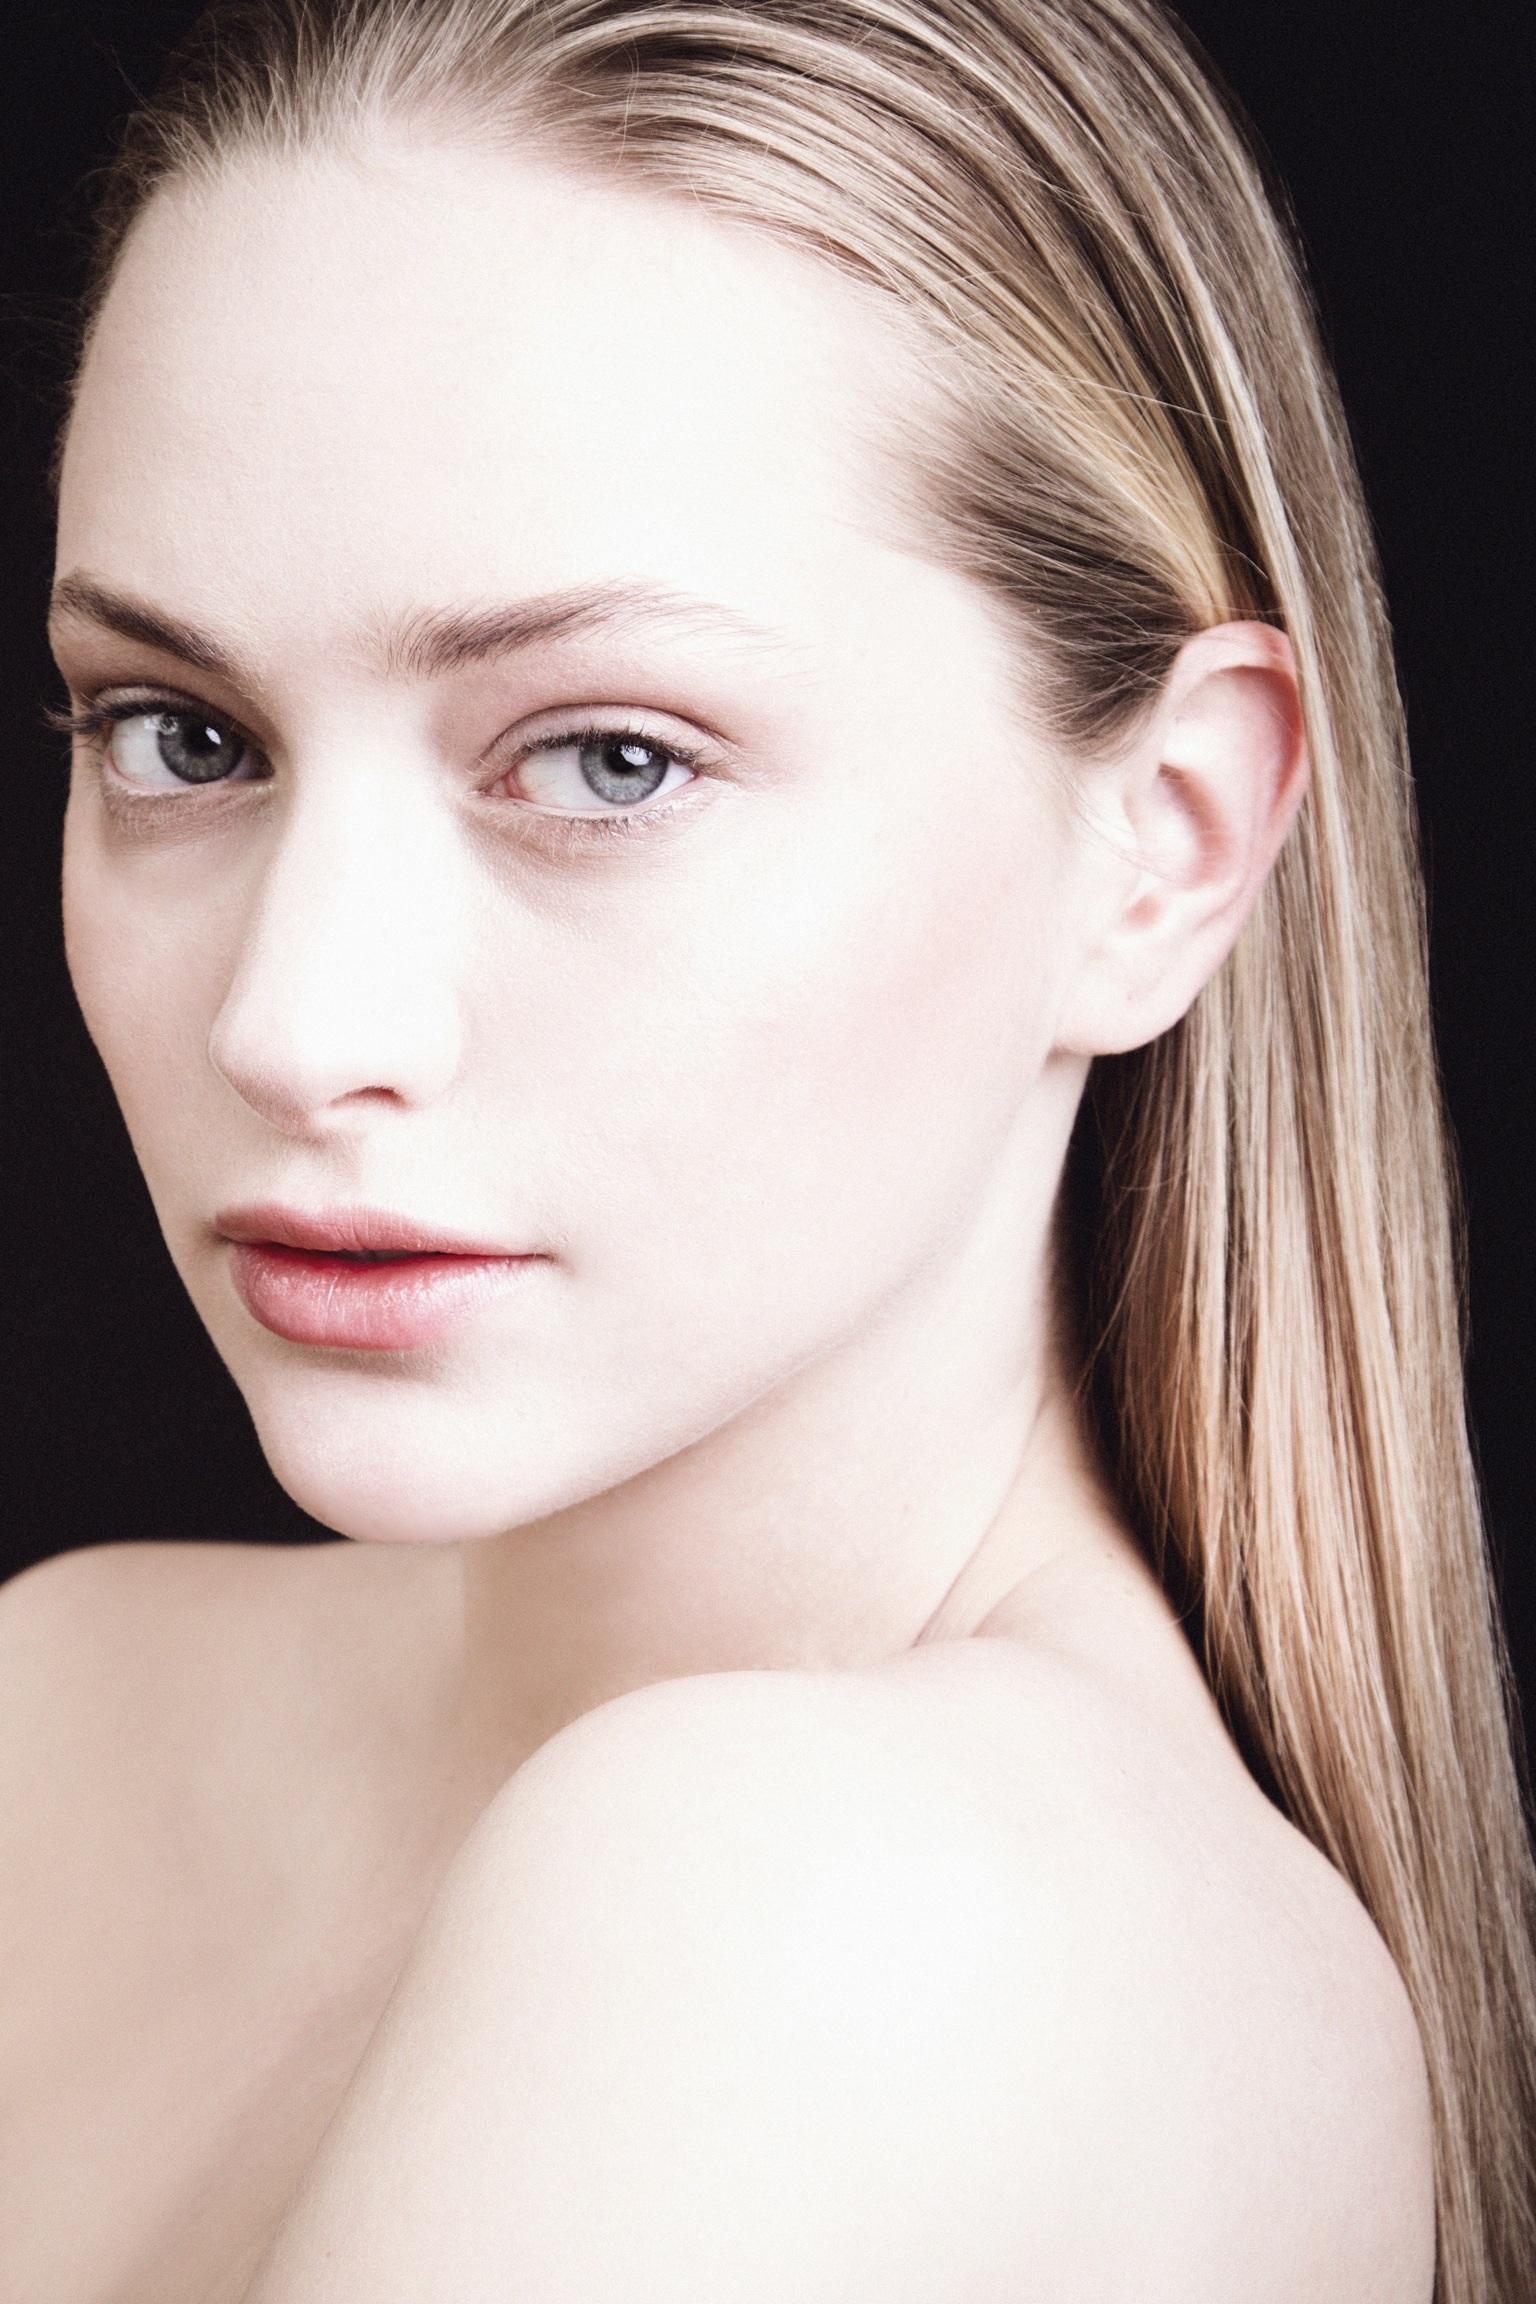 Yianni Tsapatori Hair